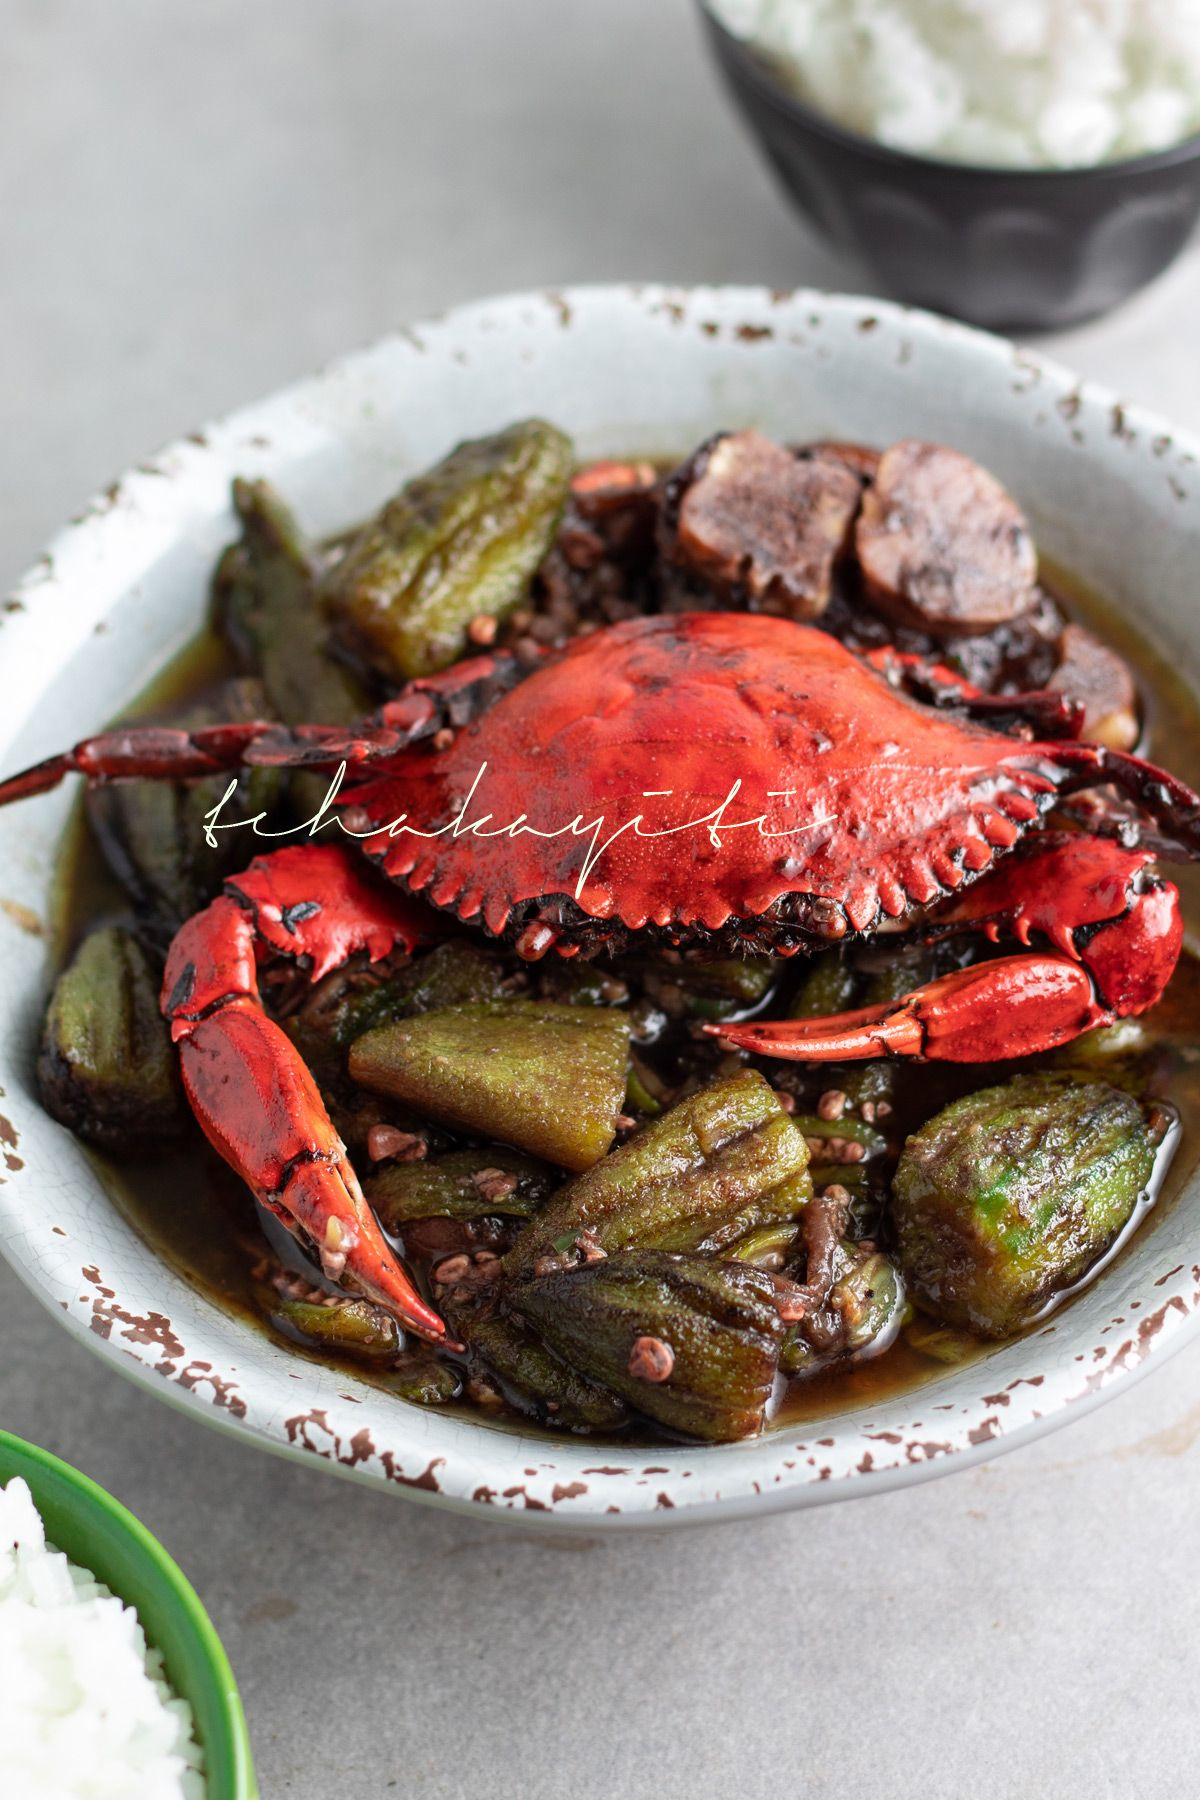 Haitian Style Okra Stew Infused With Blue Crab Tchakayiti Recipe In 2020 Haitian Food Recipes Okra Stew Stuffed Peppers